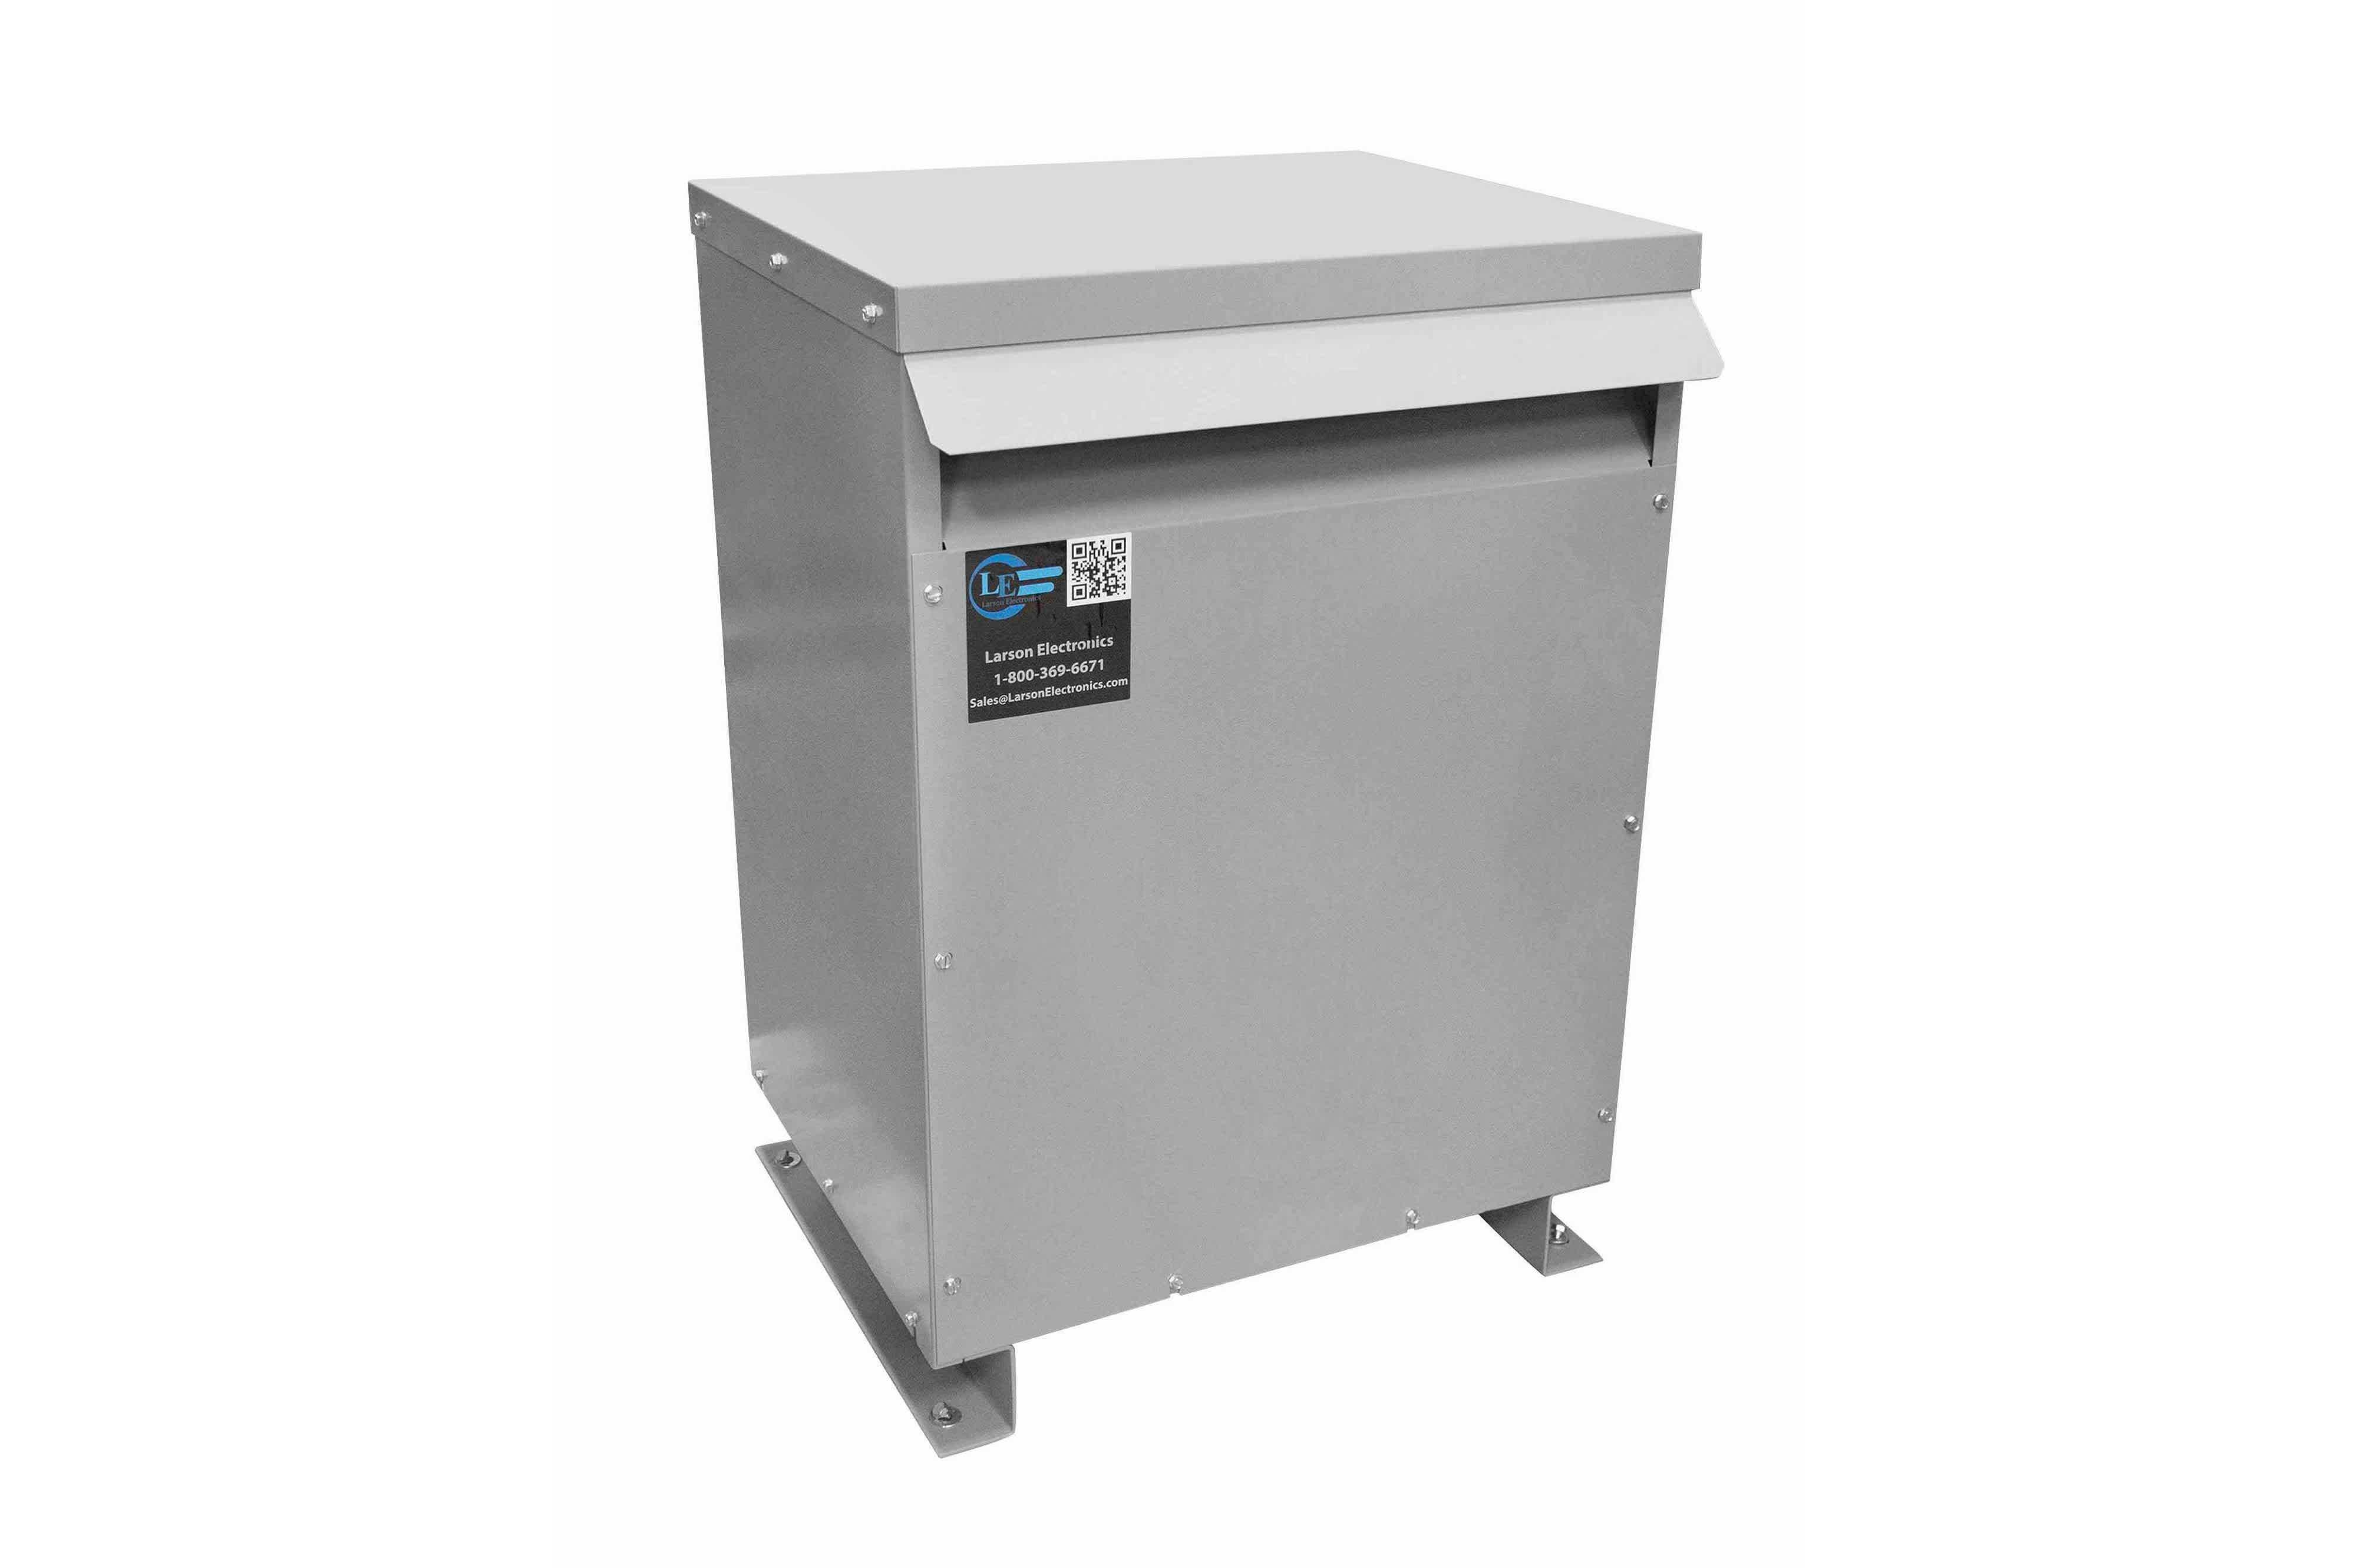 18 kVA 3PH Isolation Transformer, 460V Wye Primary, 240V/120 Delta Secondary, N3R, Ventilated, 60 Hz